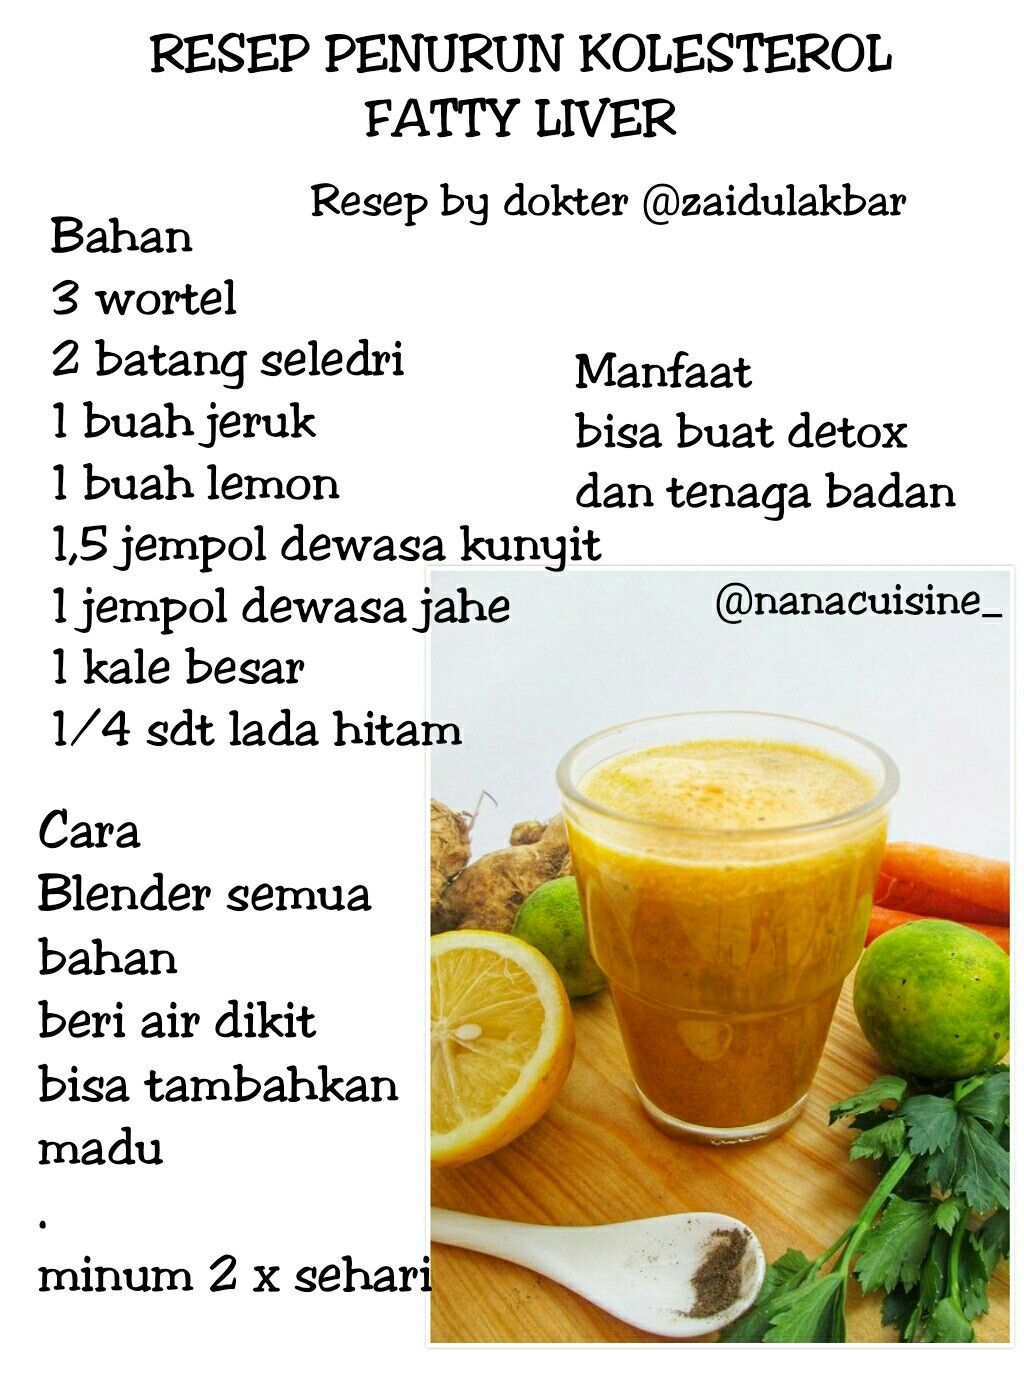 Resep Sehat Resep Diet Sehat Resep Diet Resep Sehat